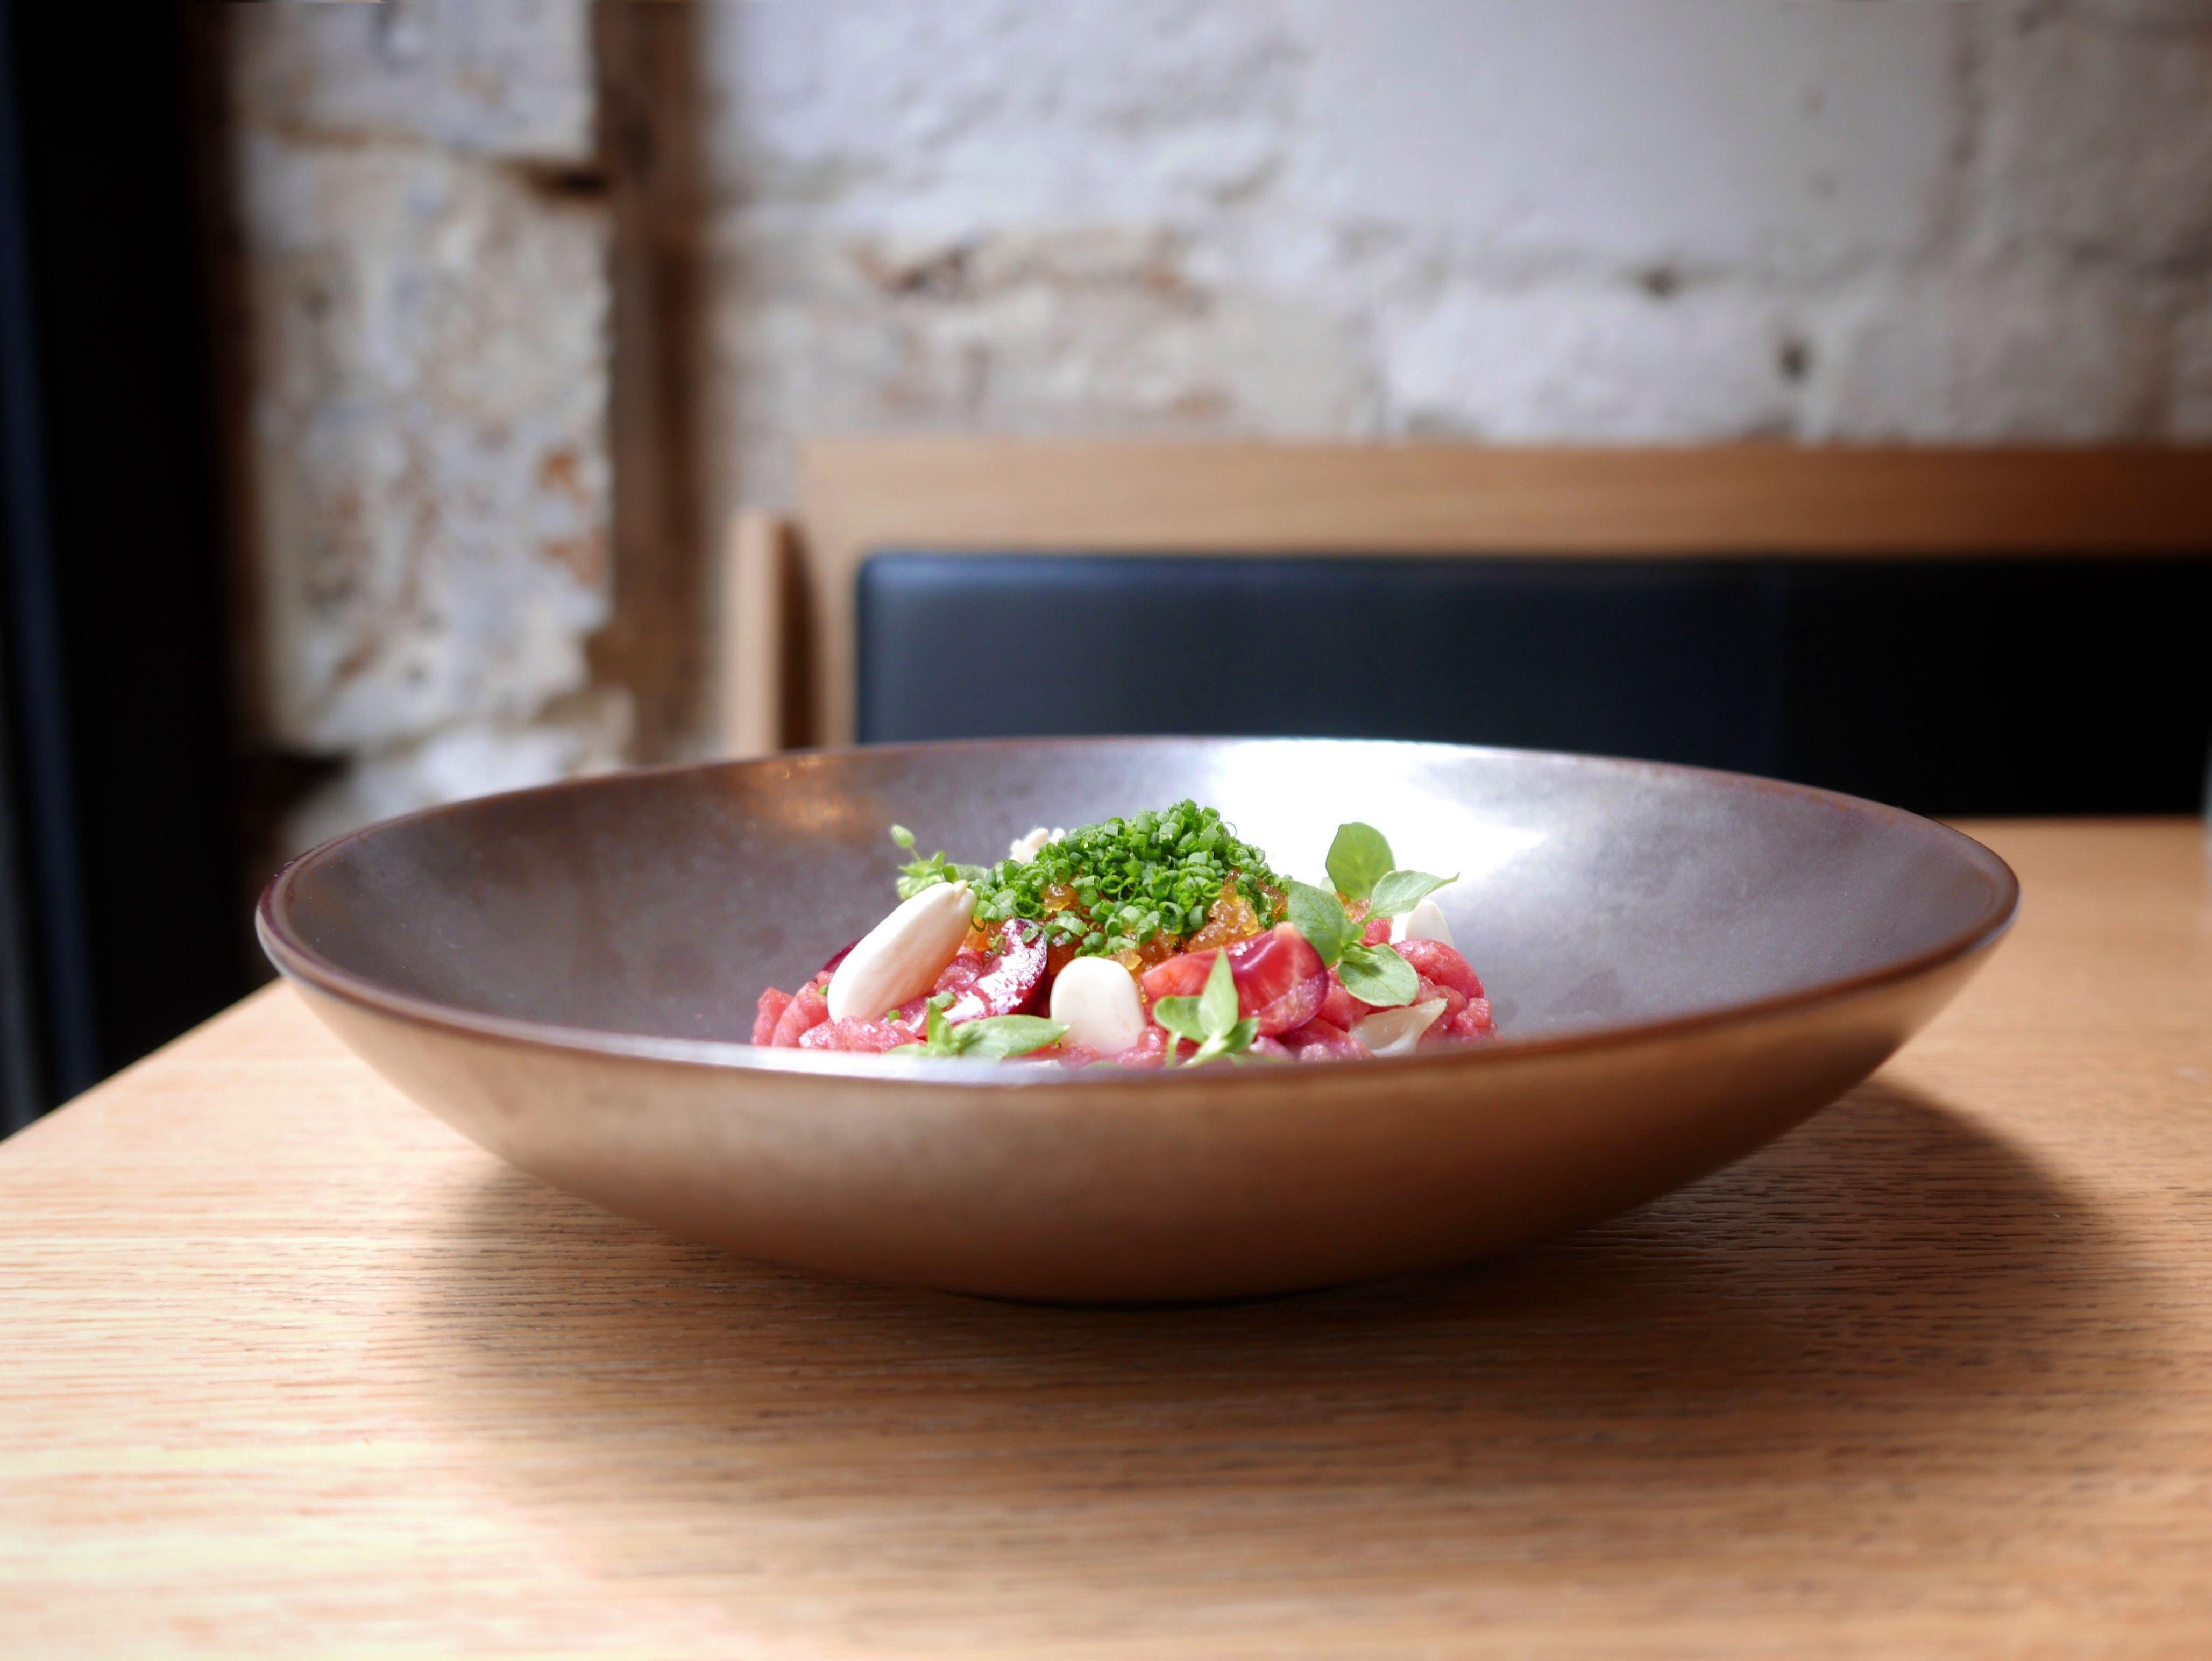 Saturne is the gastronomic nordic restaurant in Paris of chef sven chartier